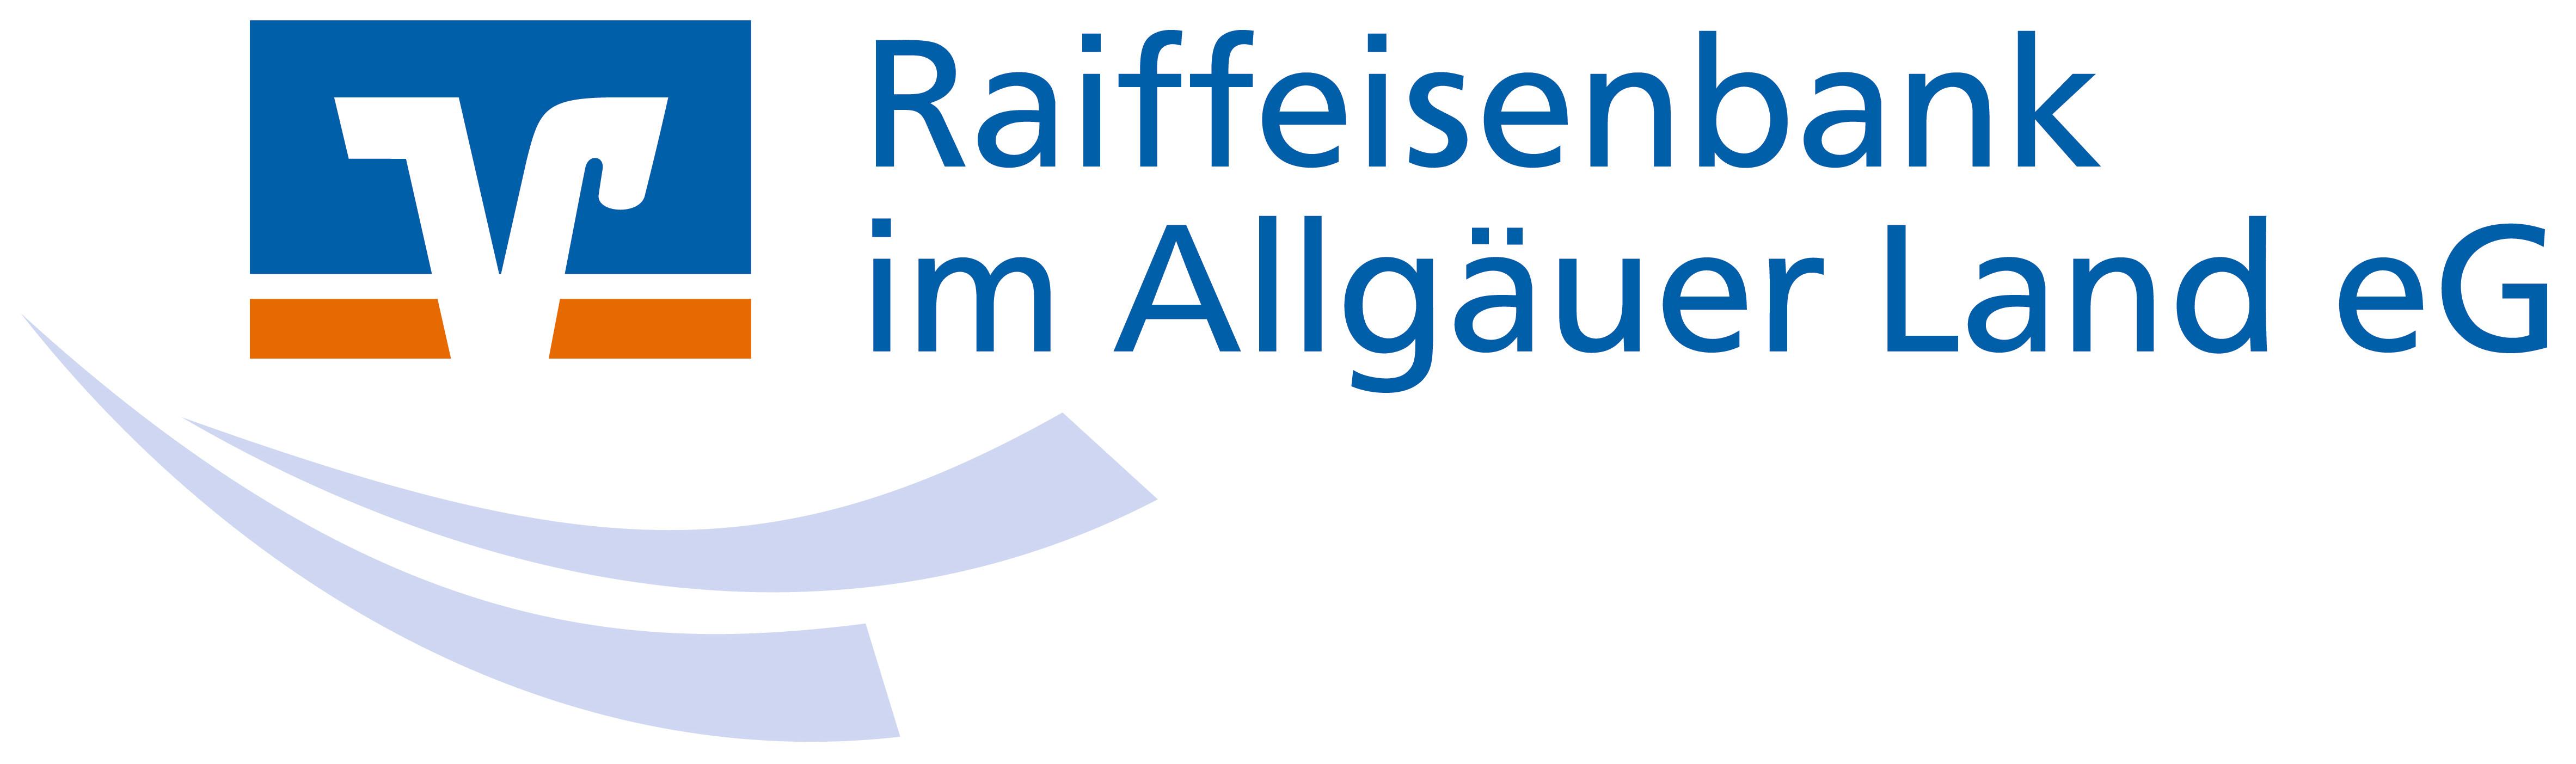 Raiffeisenbank im Allgäuer Land eG in Lauben